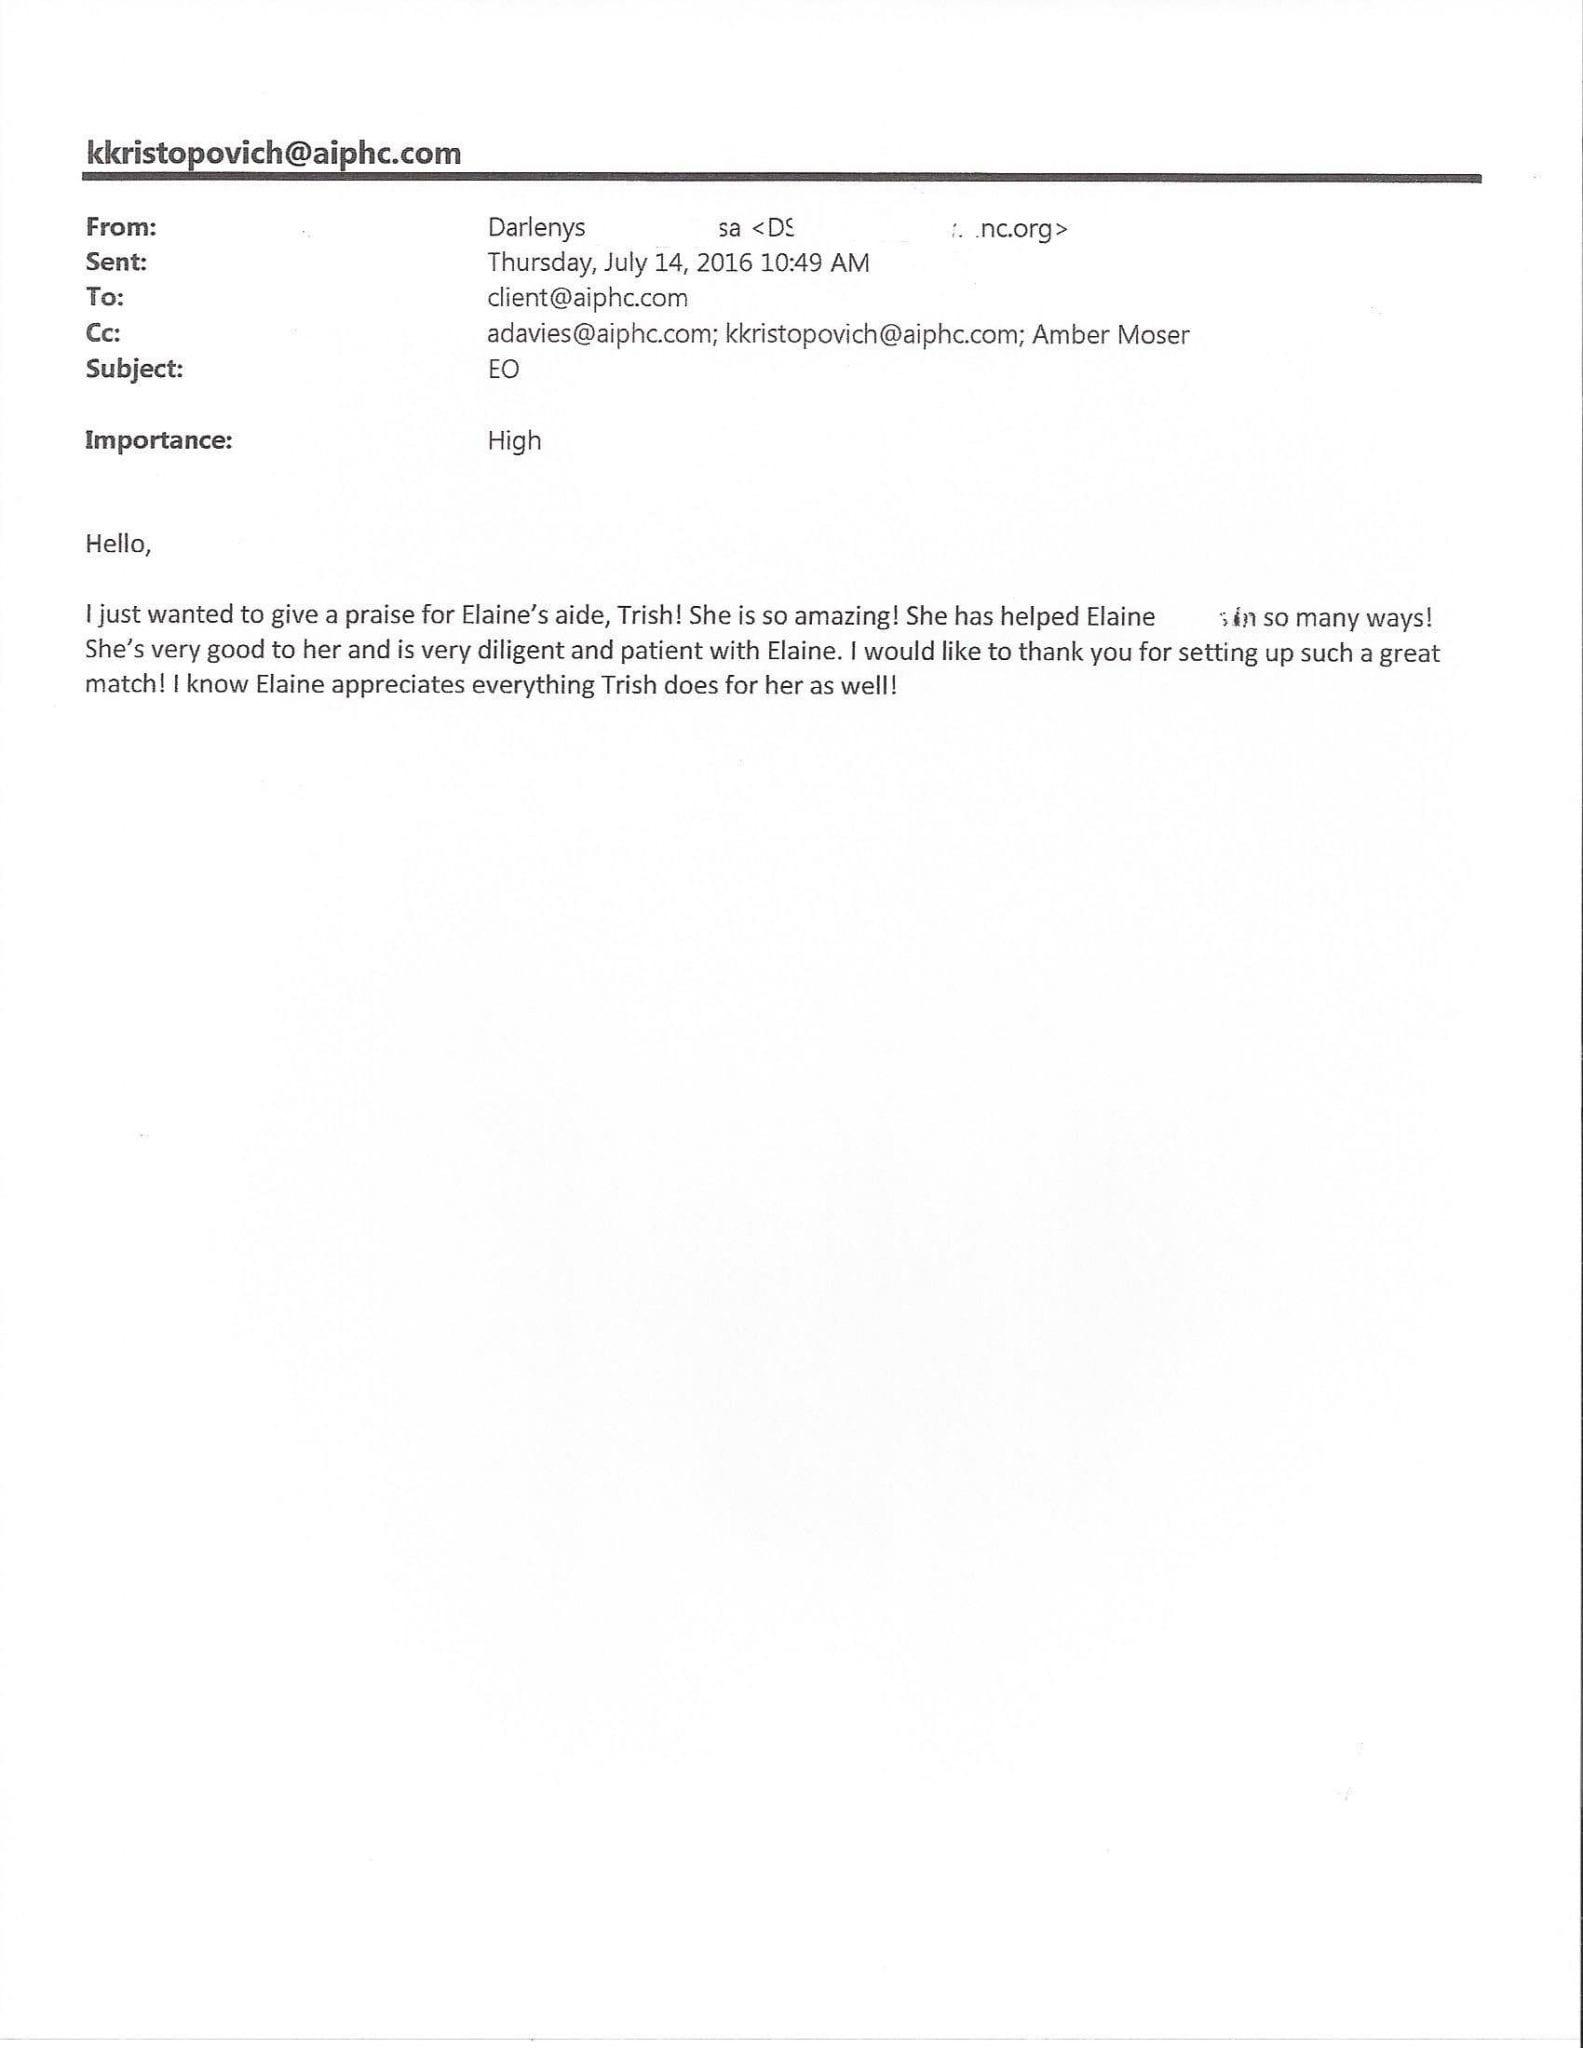 Darlenys - AIPHC Testimonial